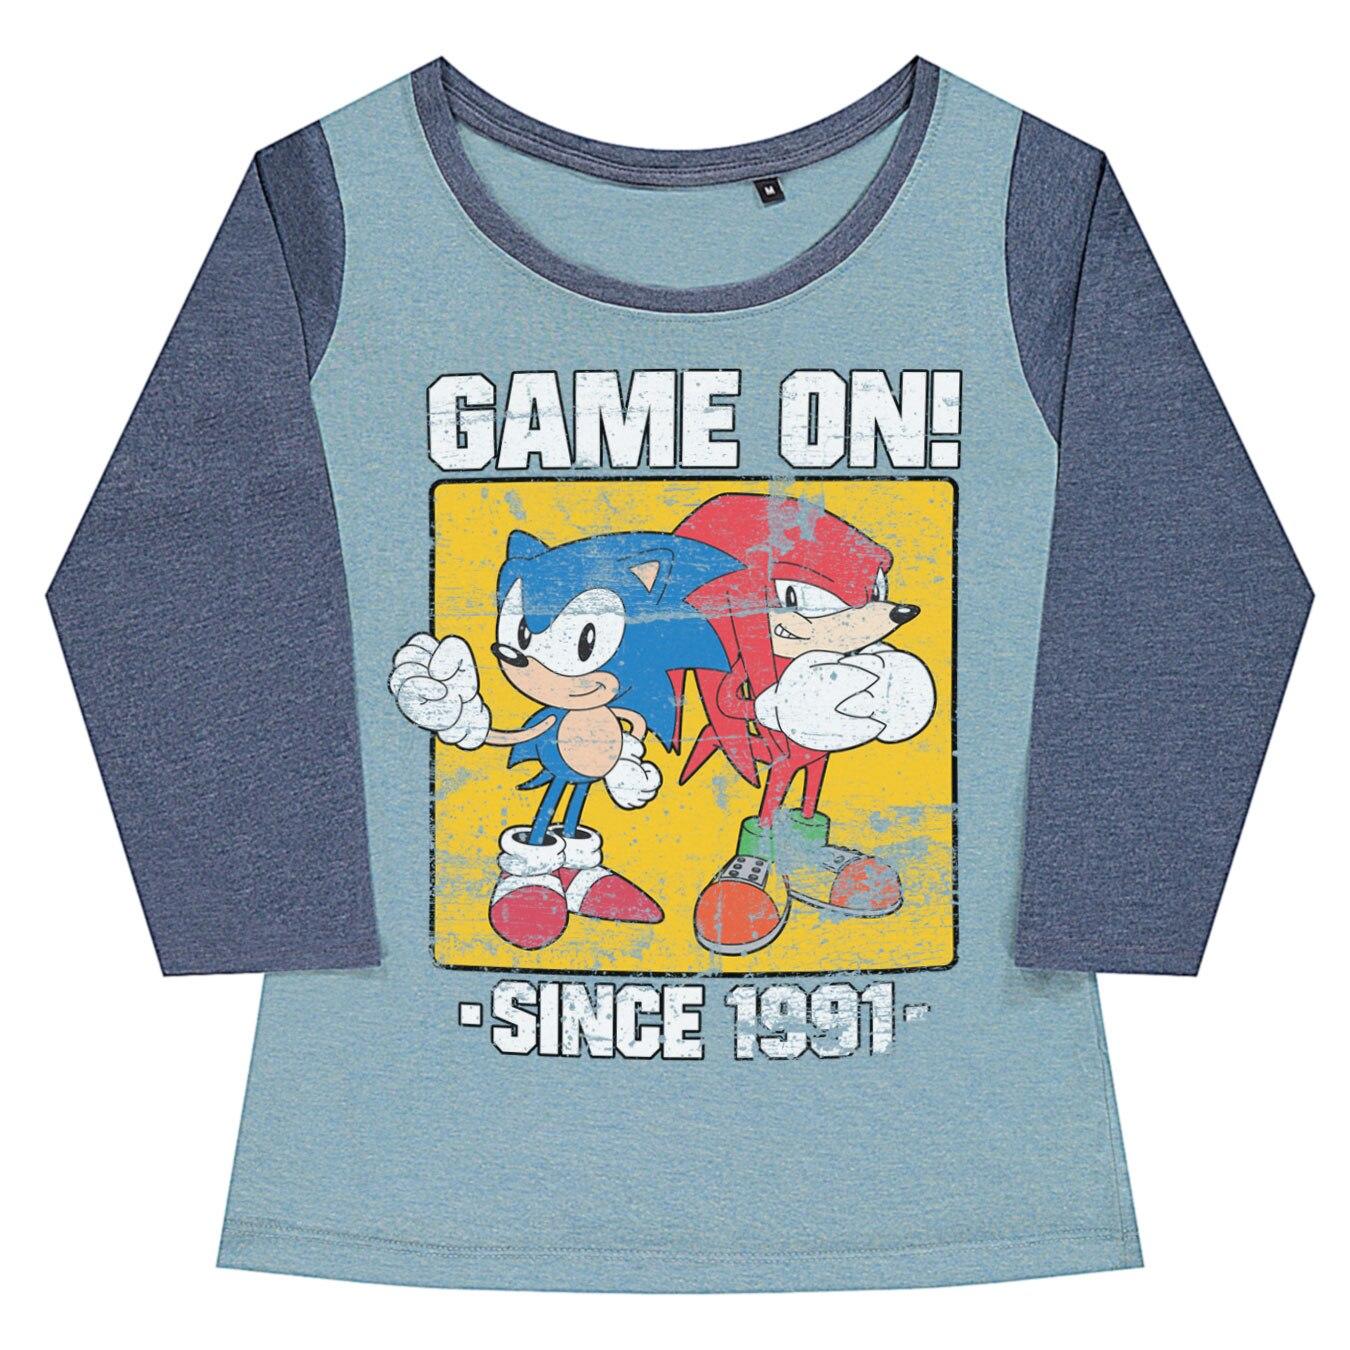 Sonic - Game On Since 1991 Baseball Girly Tee